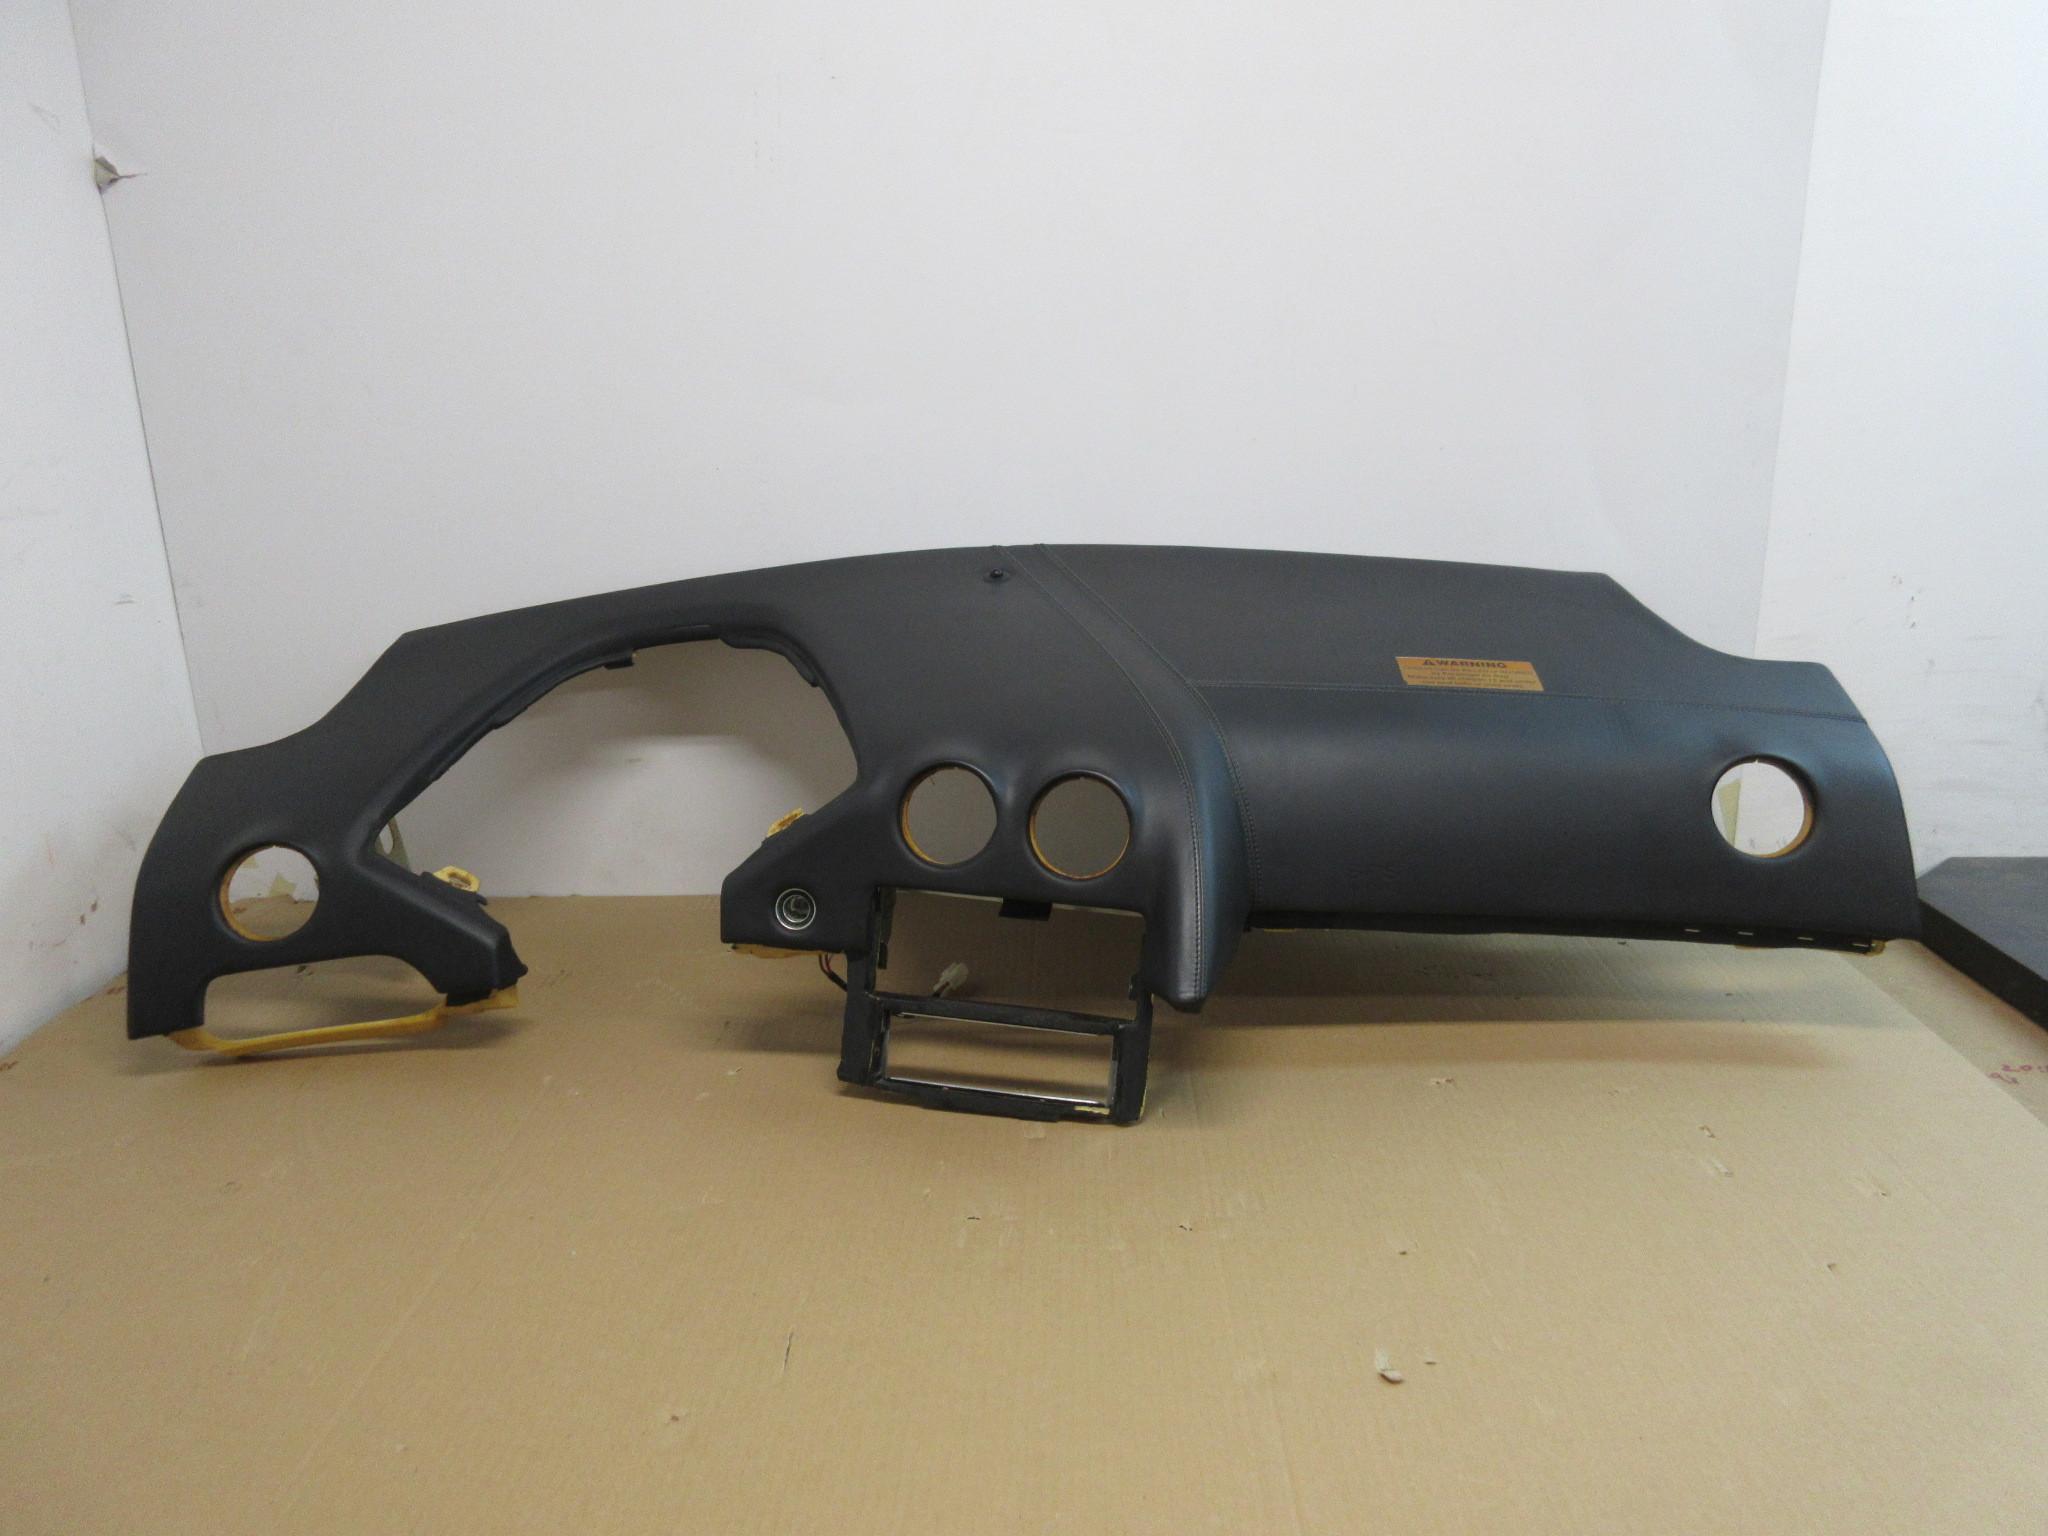 04 Lamborghini Murcielago 1025 Black Leather Dashboard Dash Pk